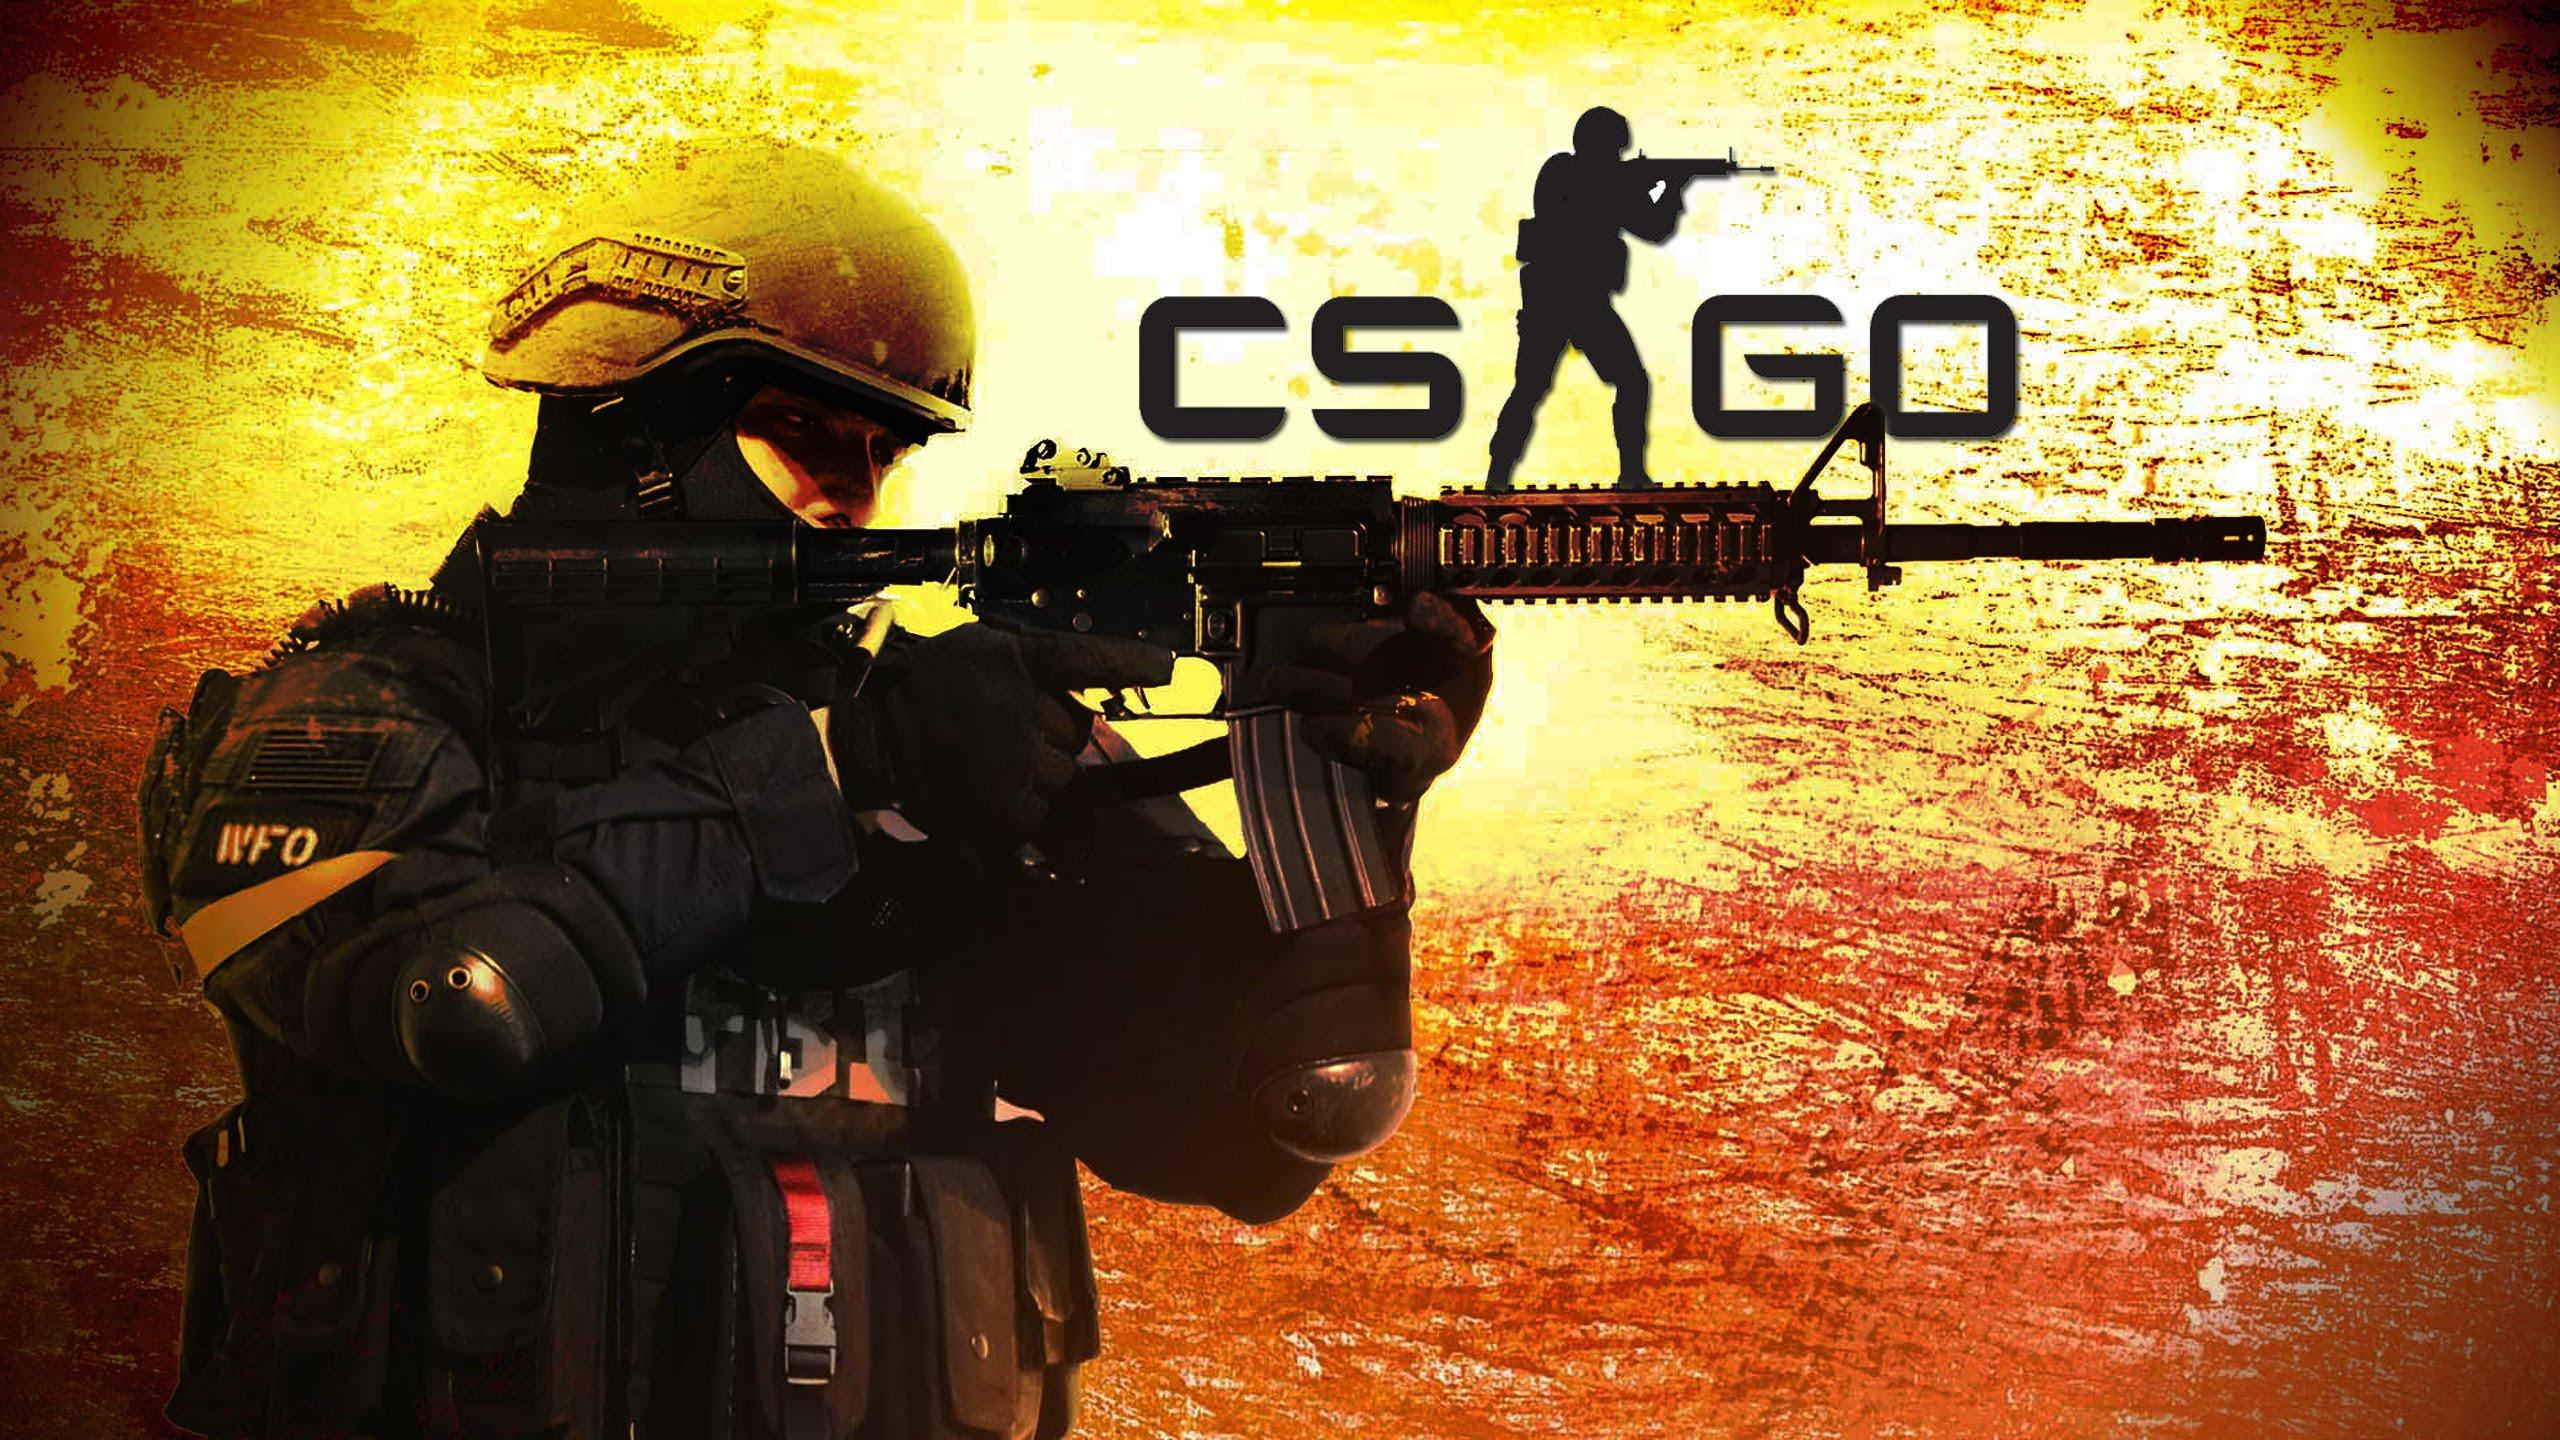 Киберспортивная игра Counter-Strike: Global Offensive